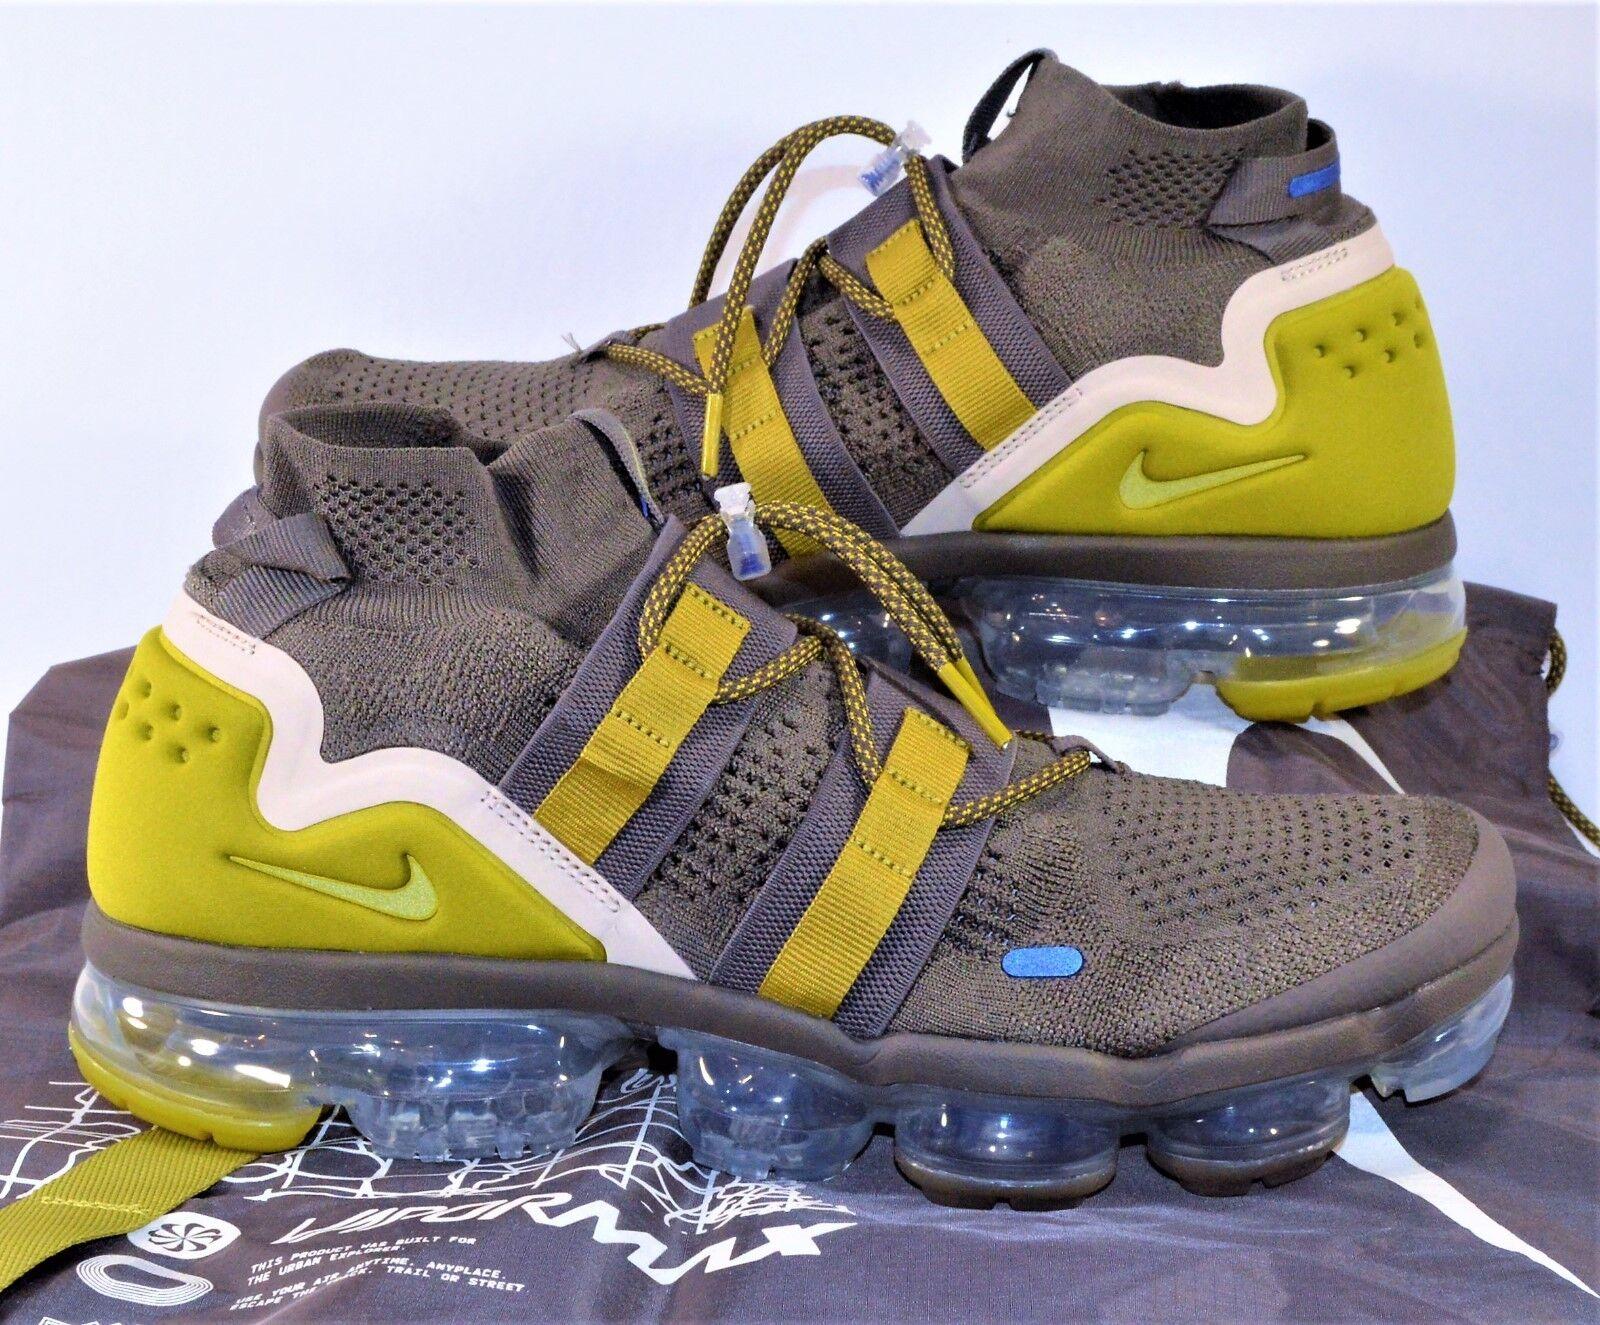 83b579f05483d Nike Vapormax FK Utility Flyknit Ridgerock Ridgerock Ridgerock Running Shoes  Sz 12 NEW AH6834 200 a284e9